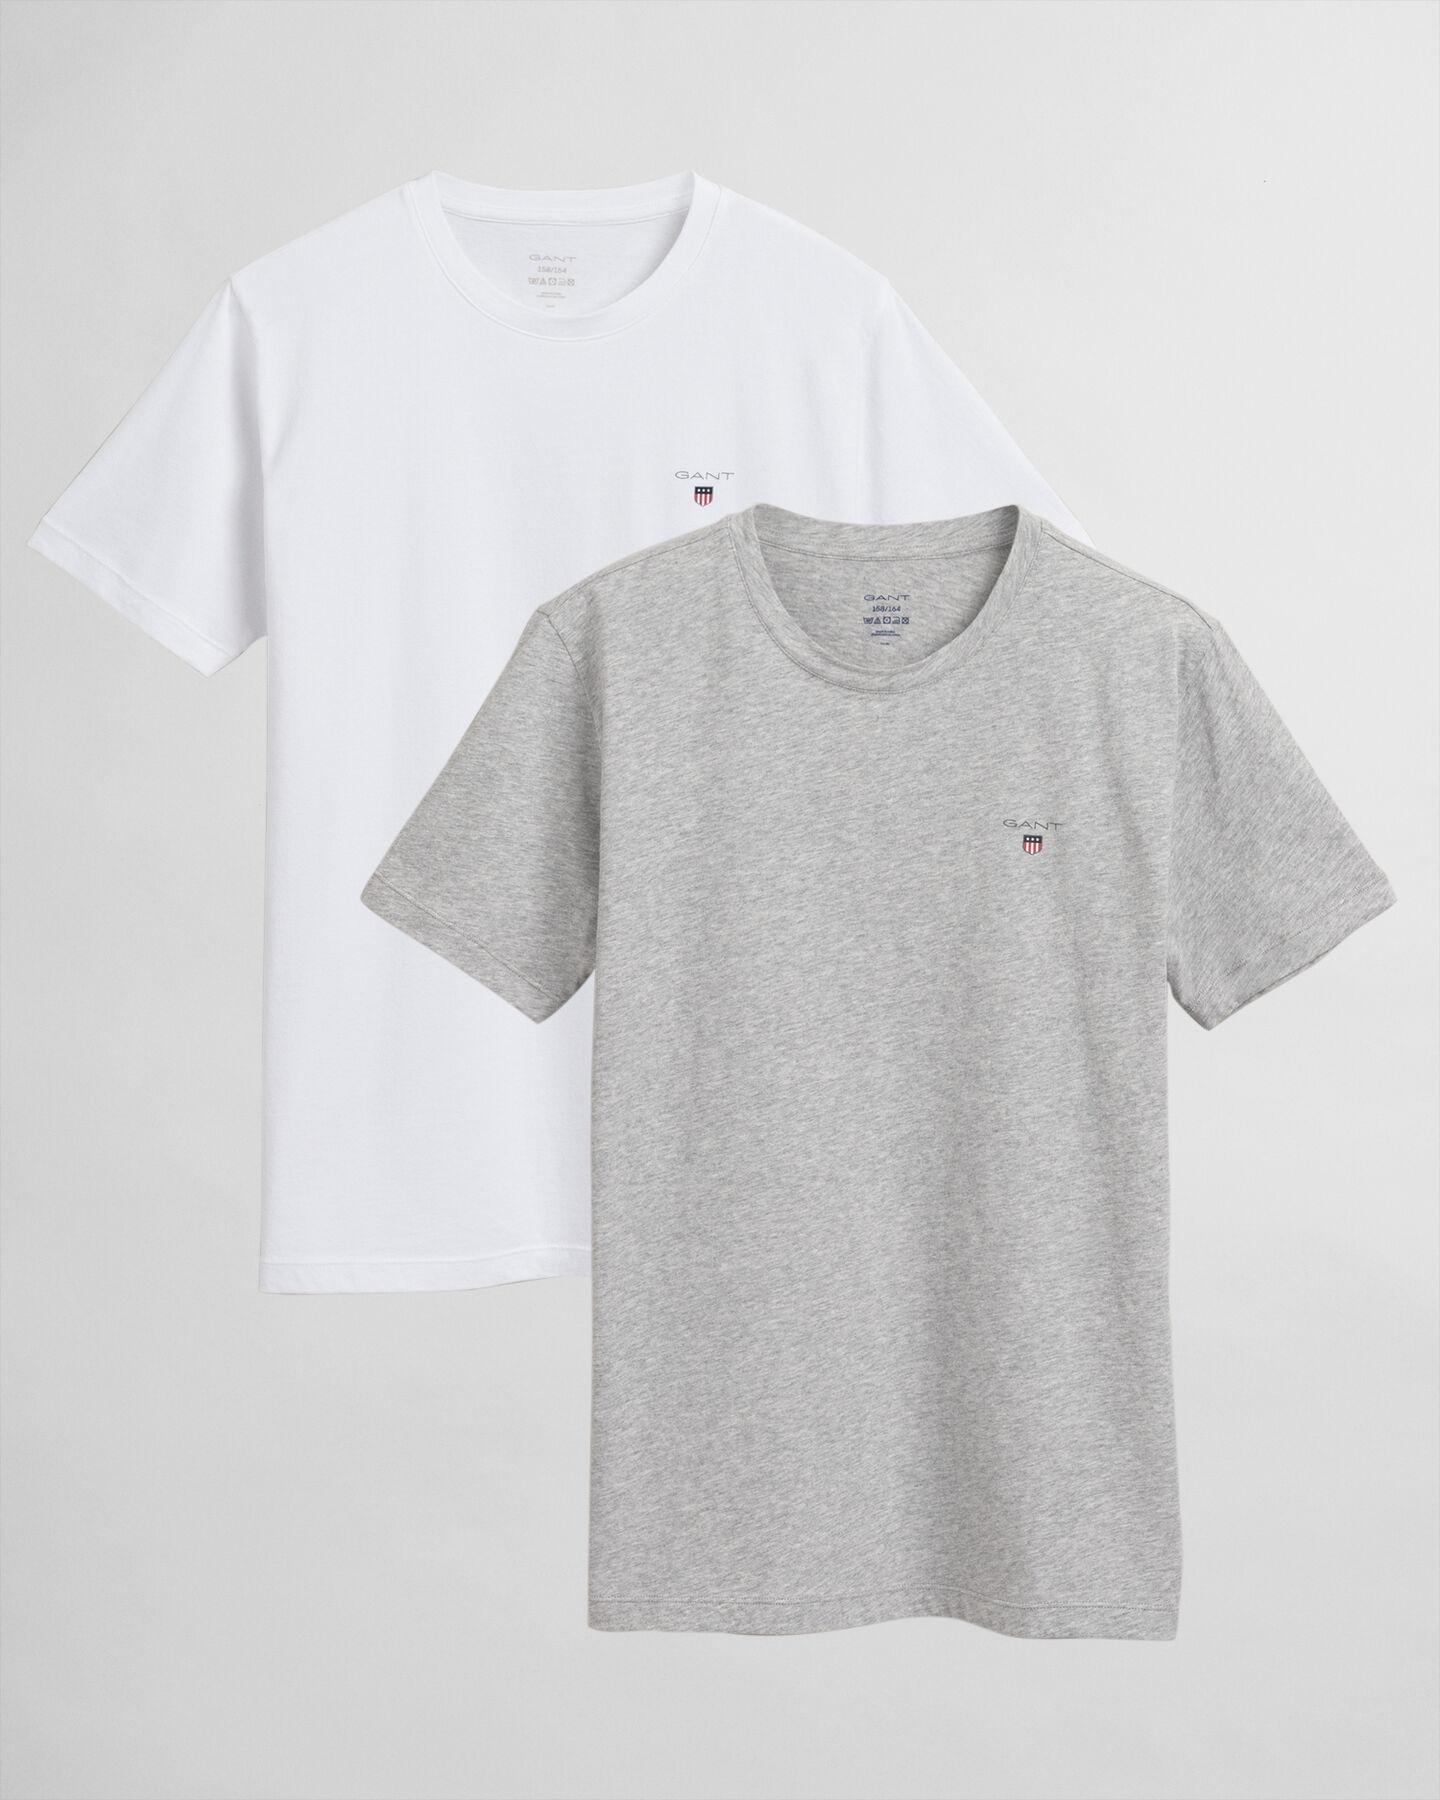 Teen Boys 2-Pack Crew Neck T-Shirts